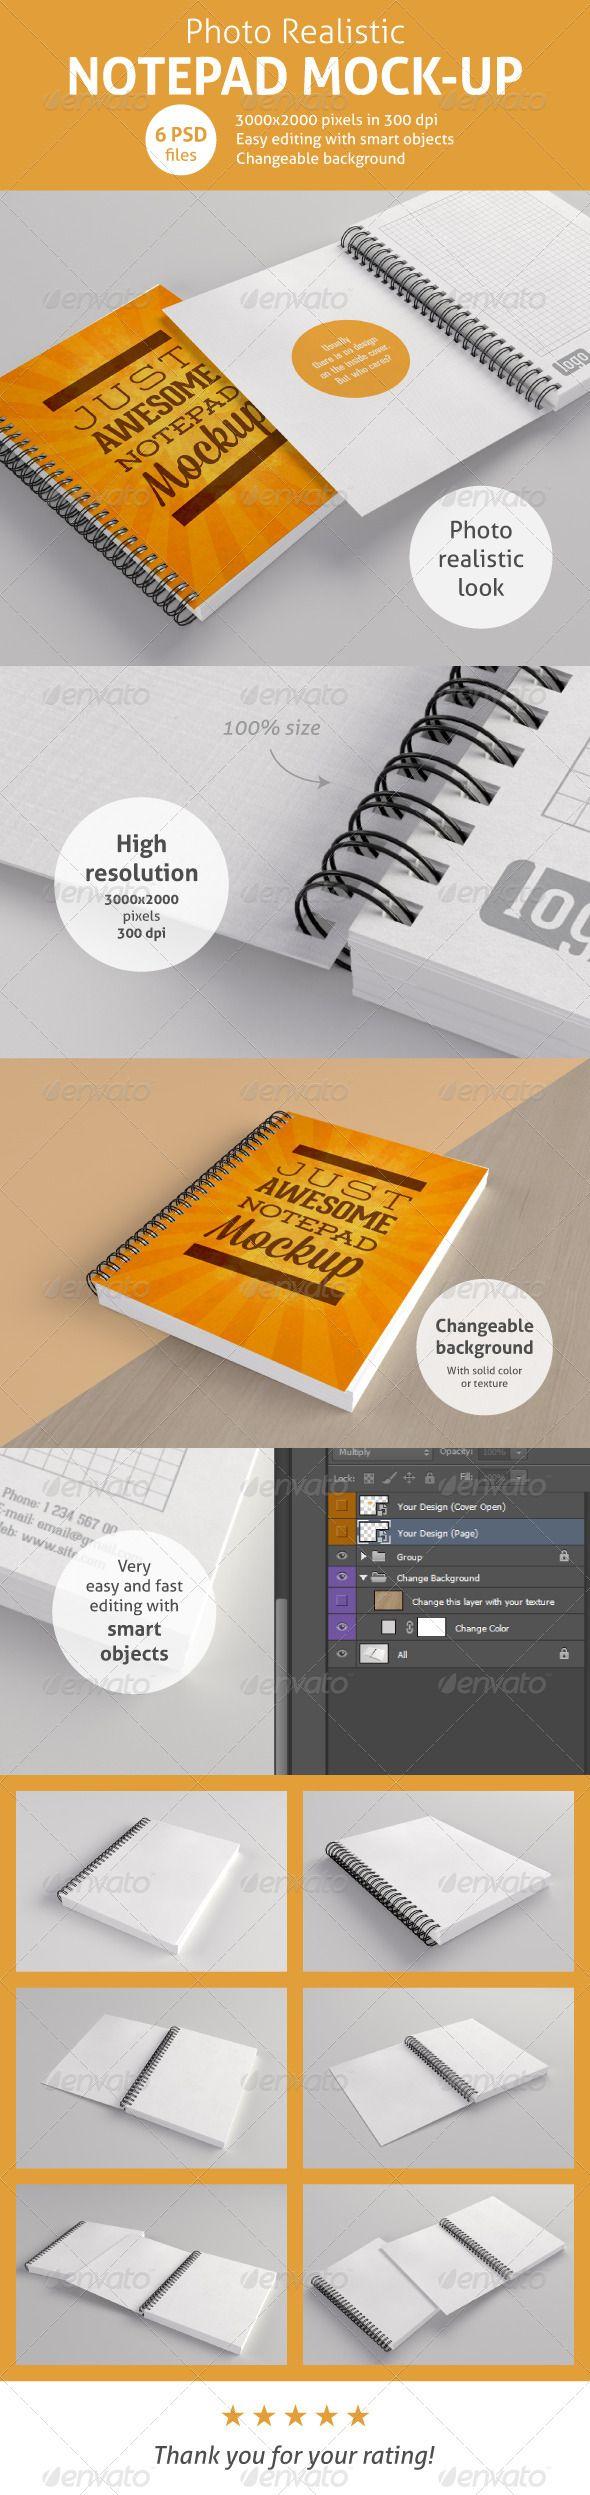 Realistic Notepad Mock Up Mockup Business Card Mock Up Mockup Photoshop